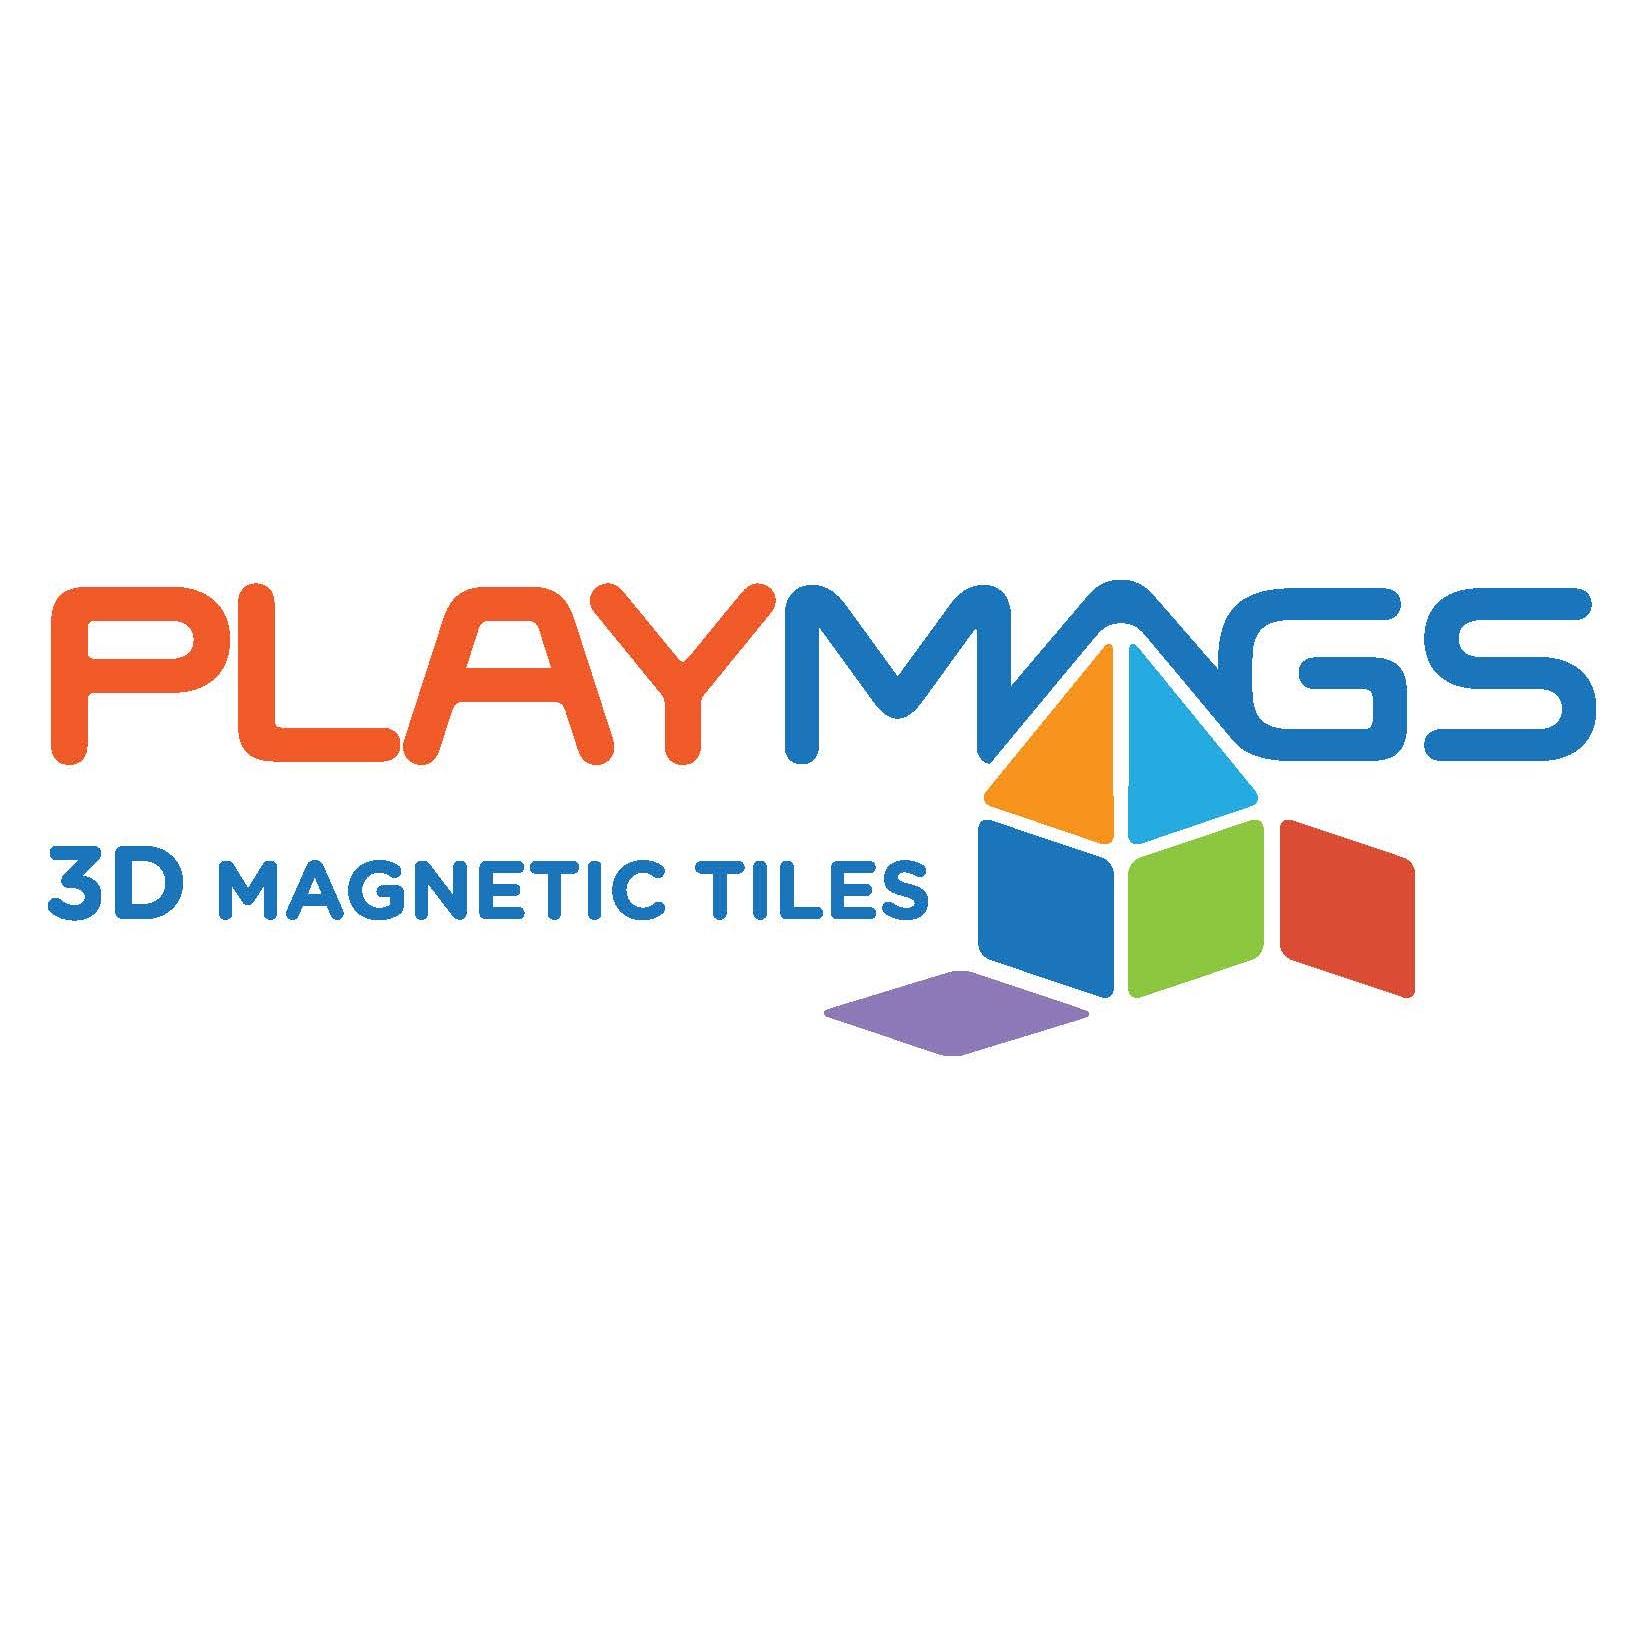 playmgs-gaiaecocrianza